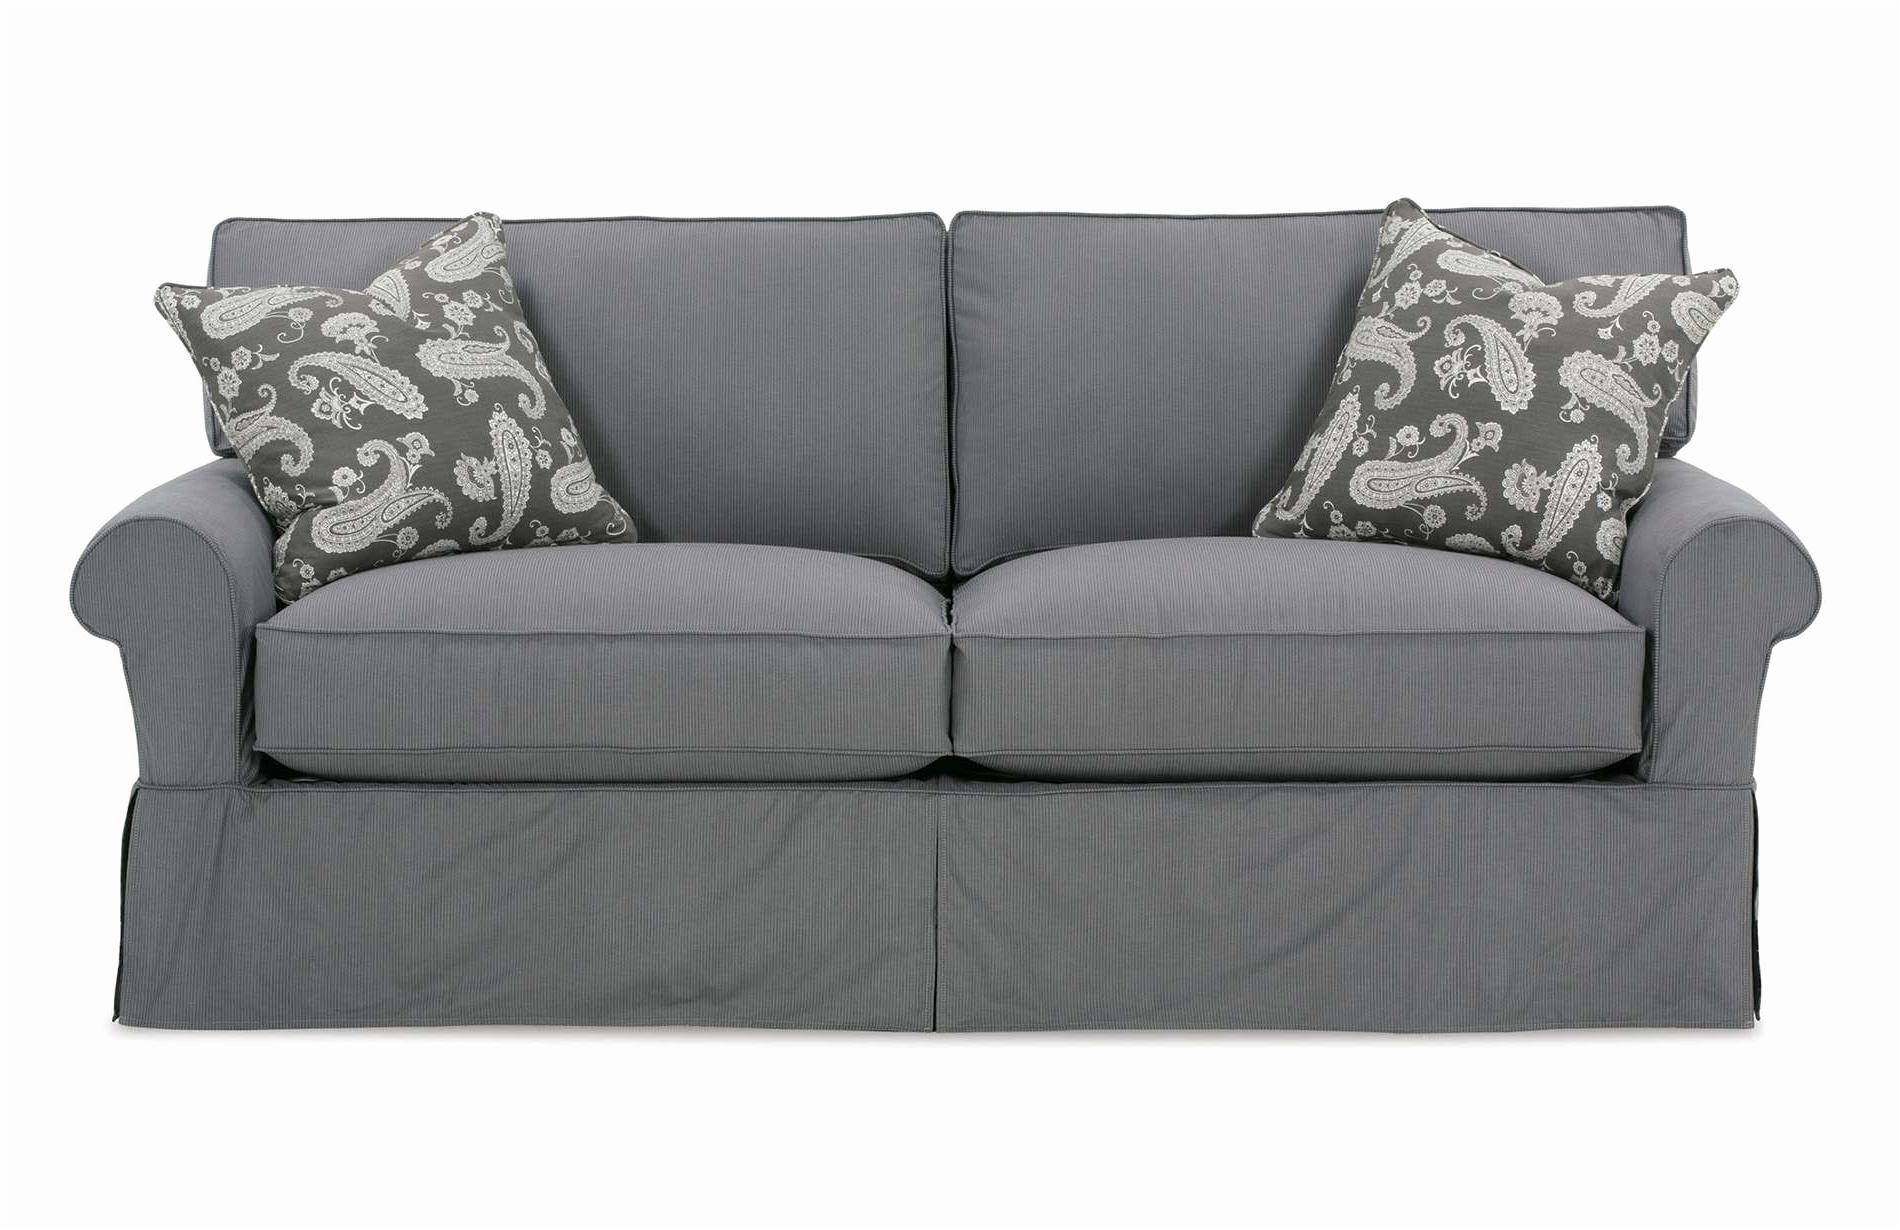 sleeper sofa covers photo - 6